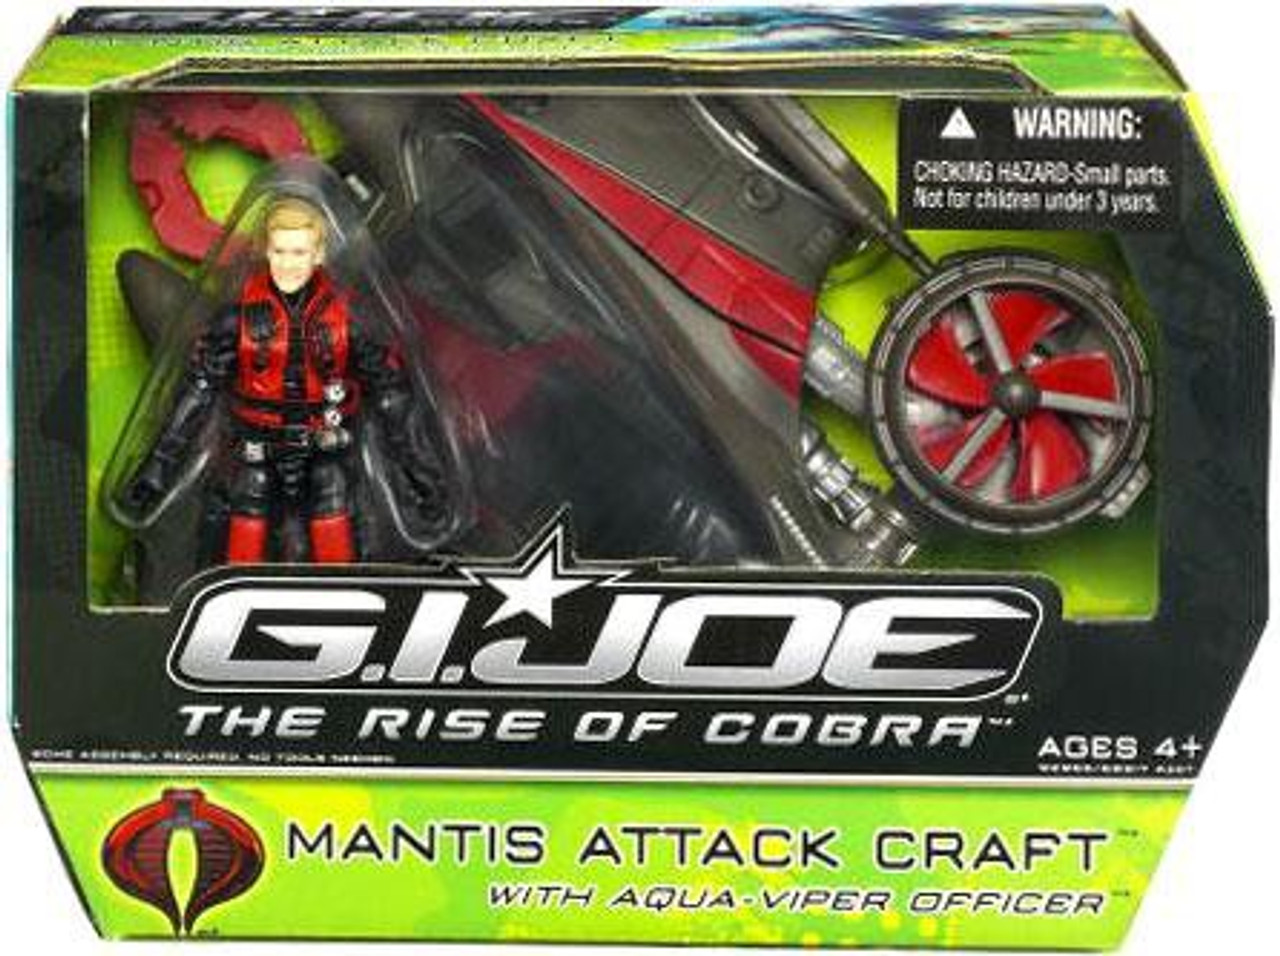 GI Joe The Rise of Cobra Mantis Attack Craft Action Figure Vehicle